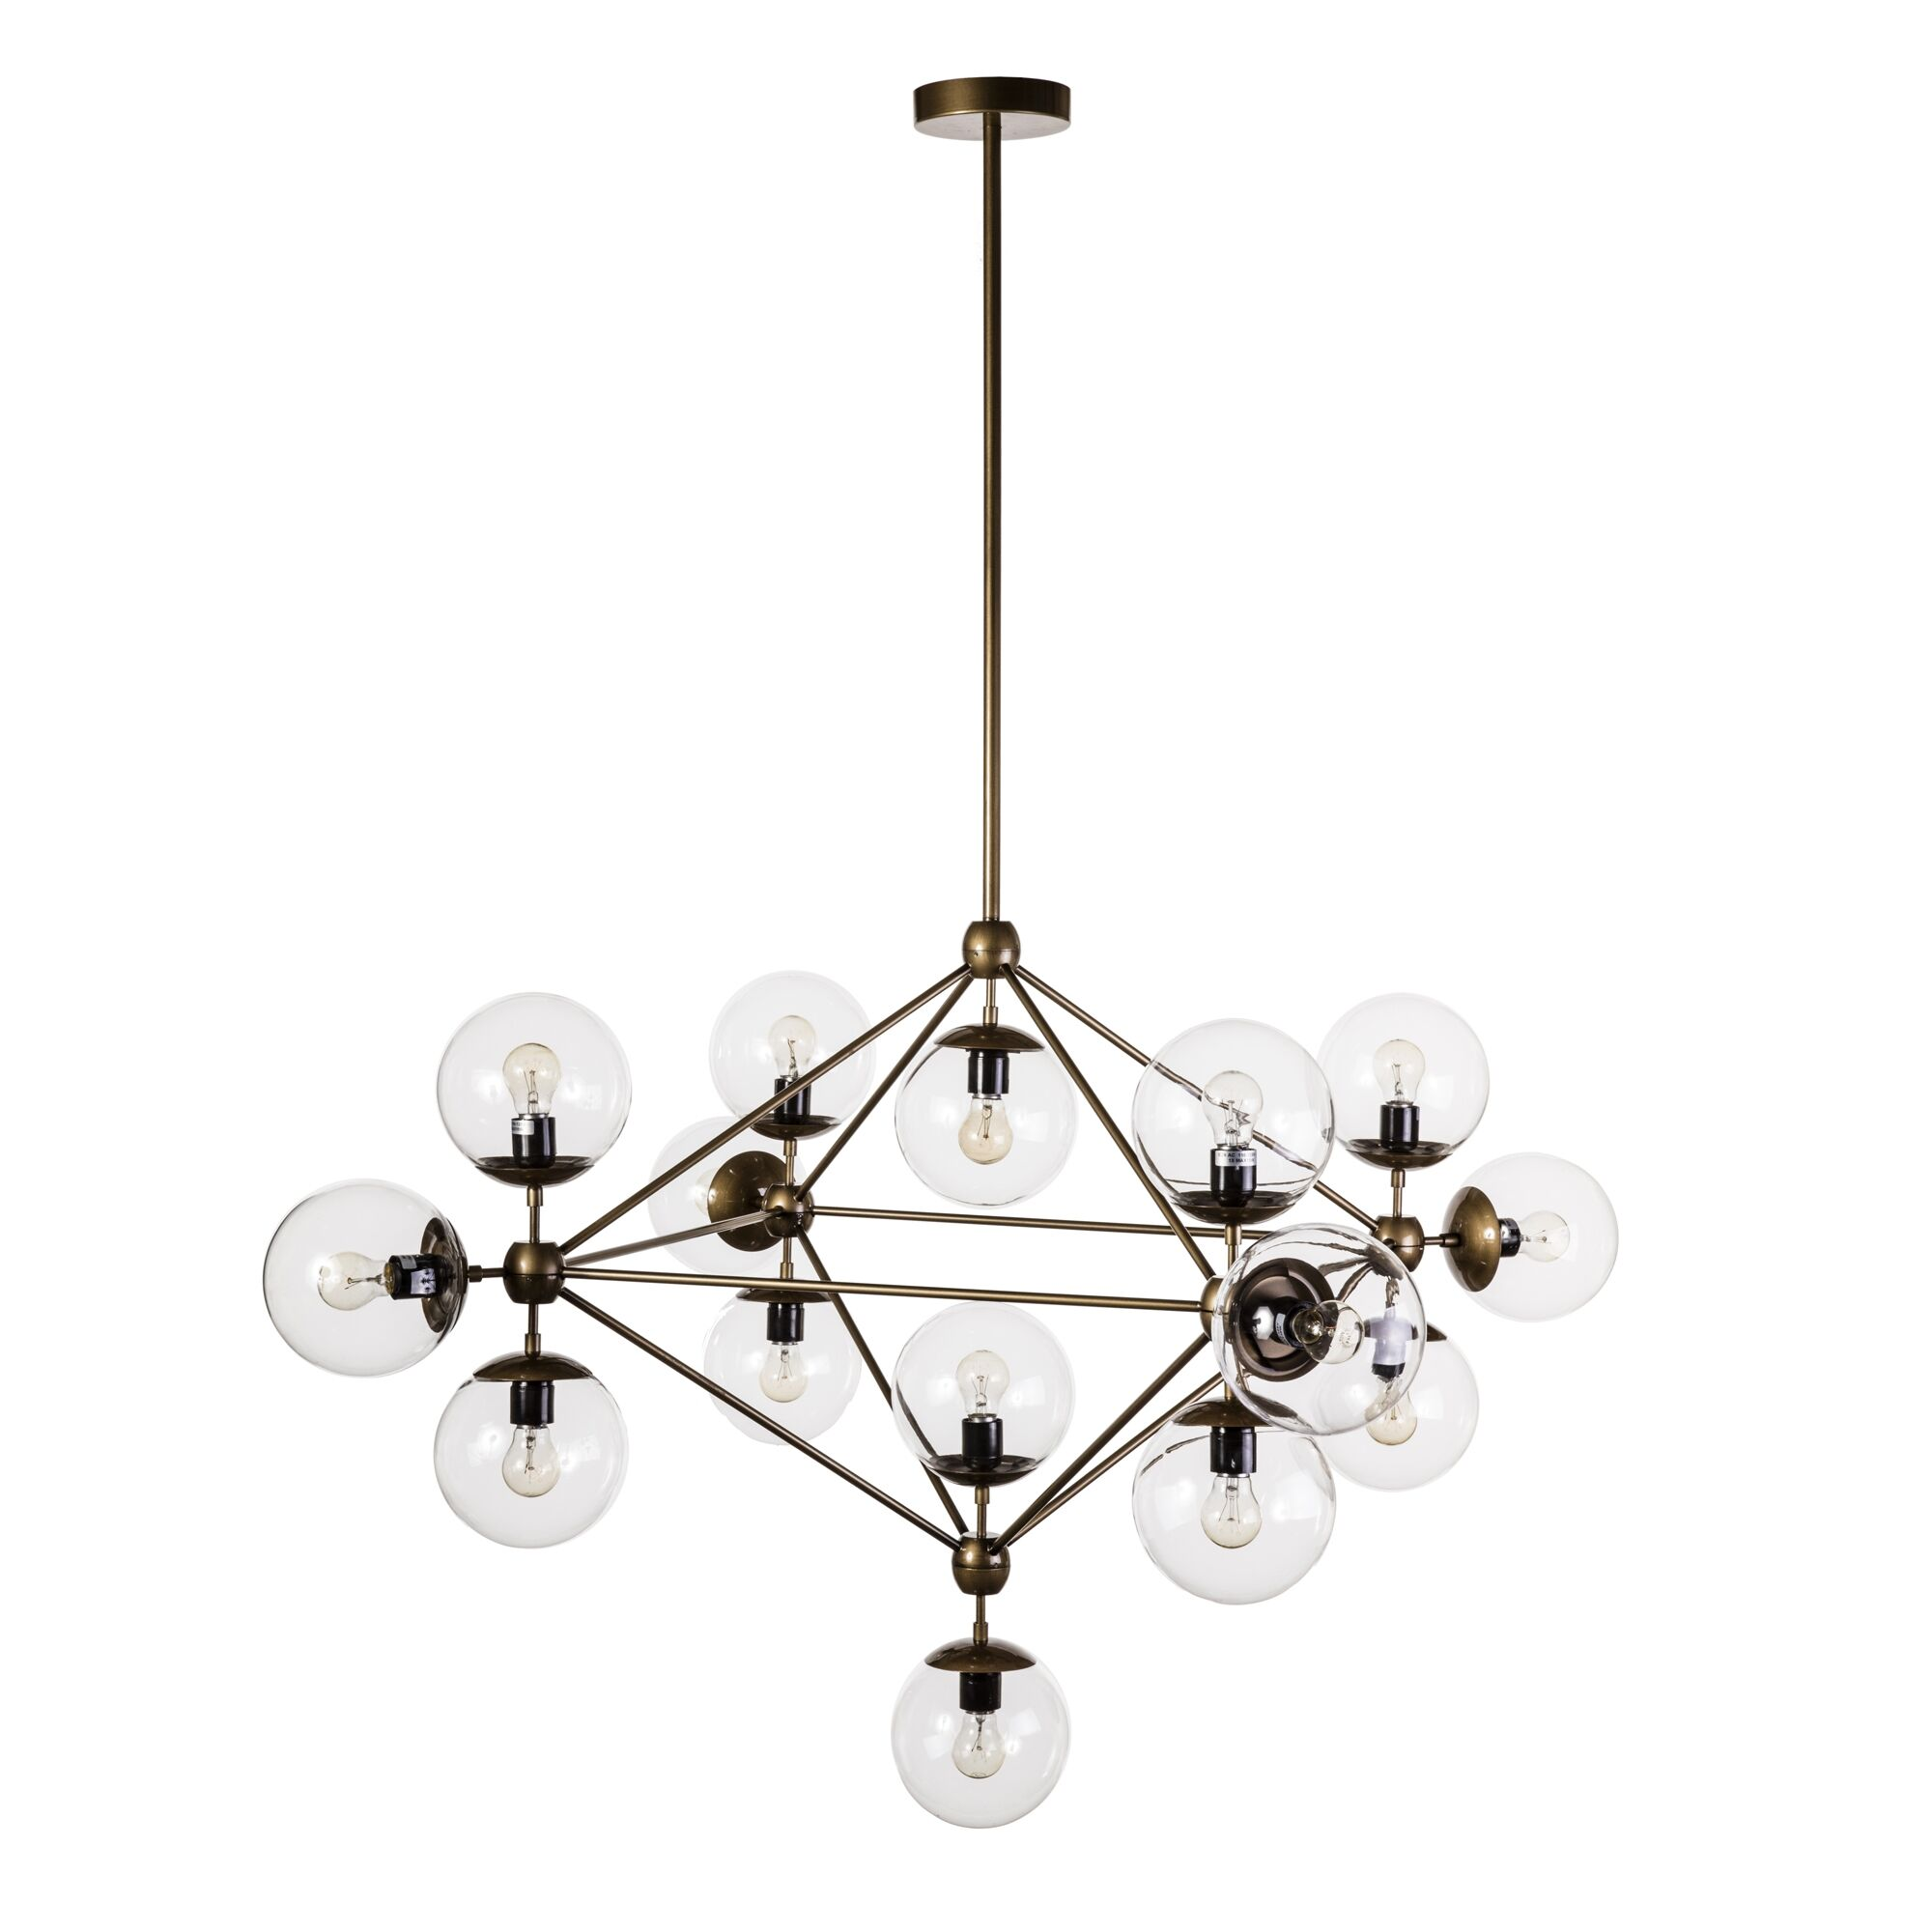 Hodge 15-Light Sputnik Chandelier Finish: Brass